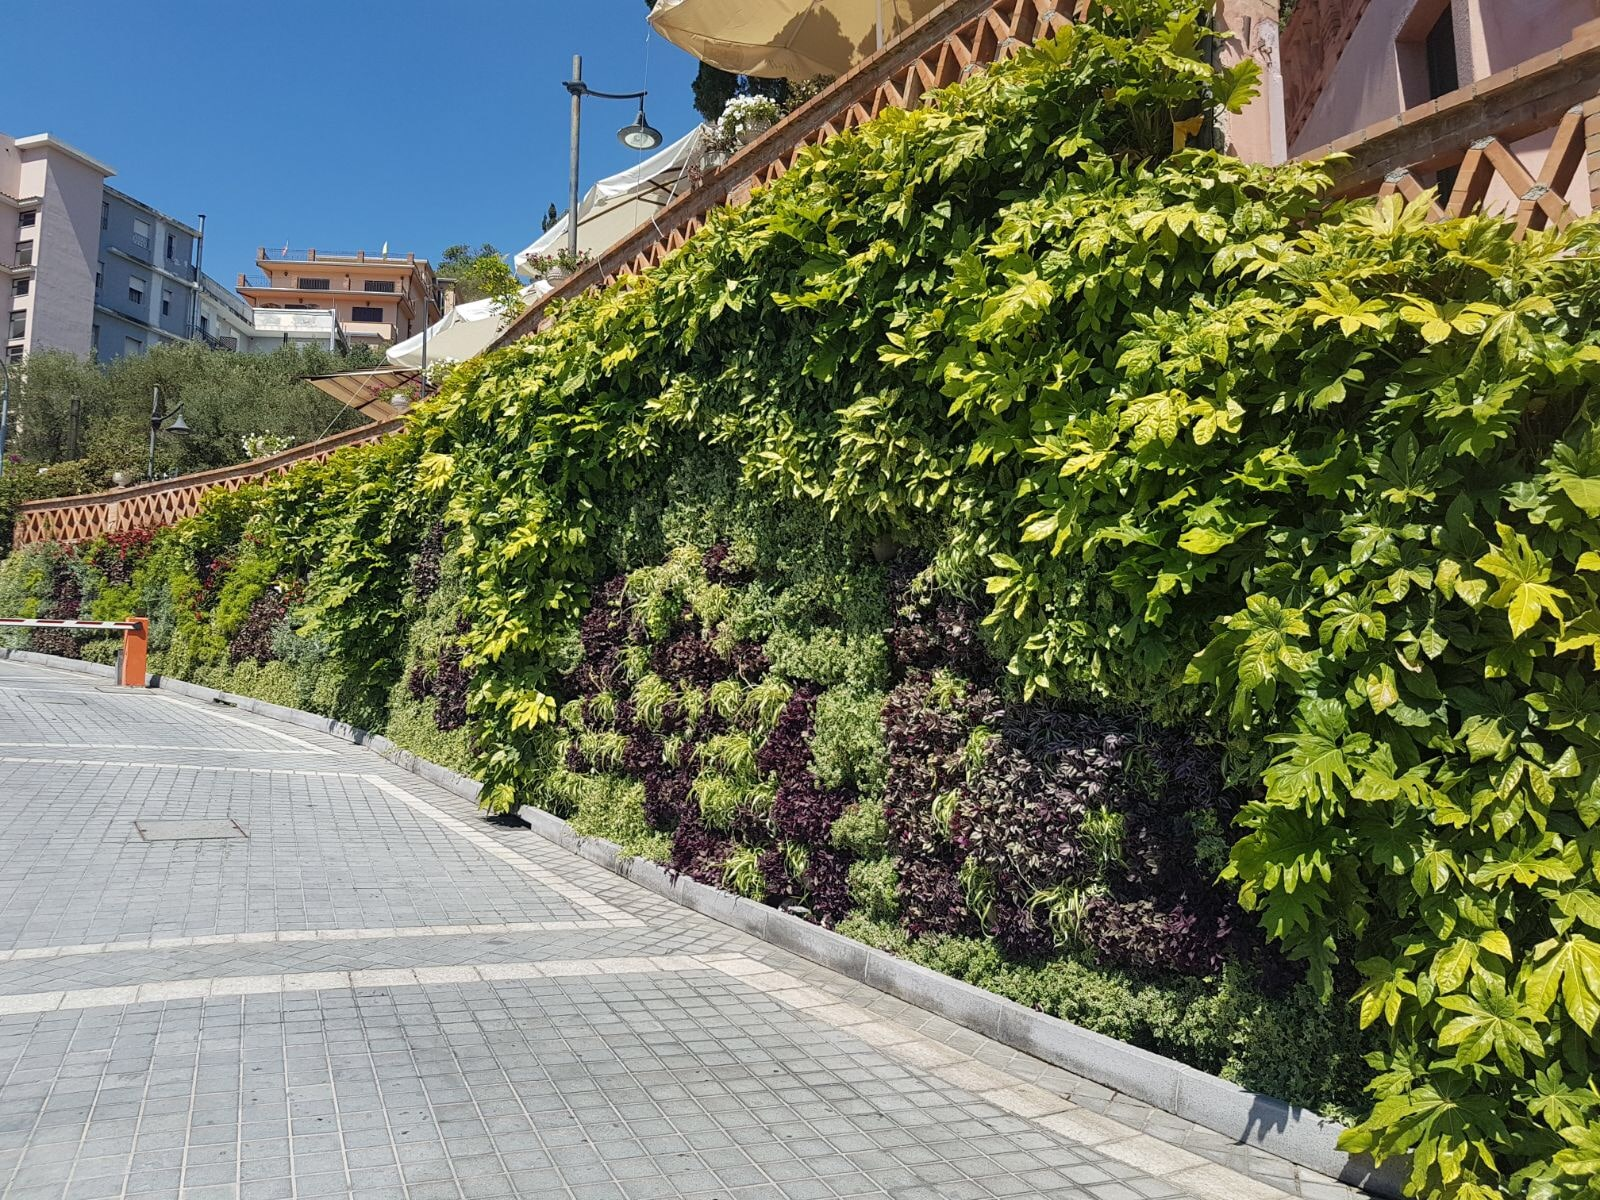 Giardini verticali interni giardino verticale interno for Giardino verticale